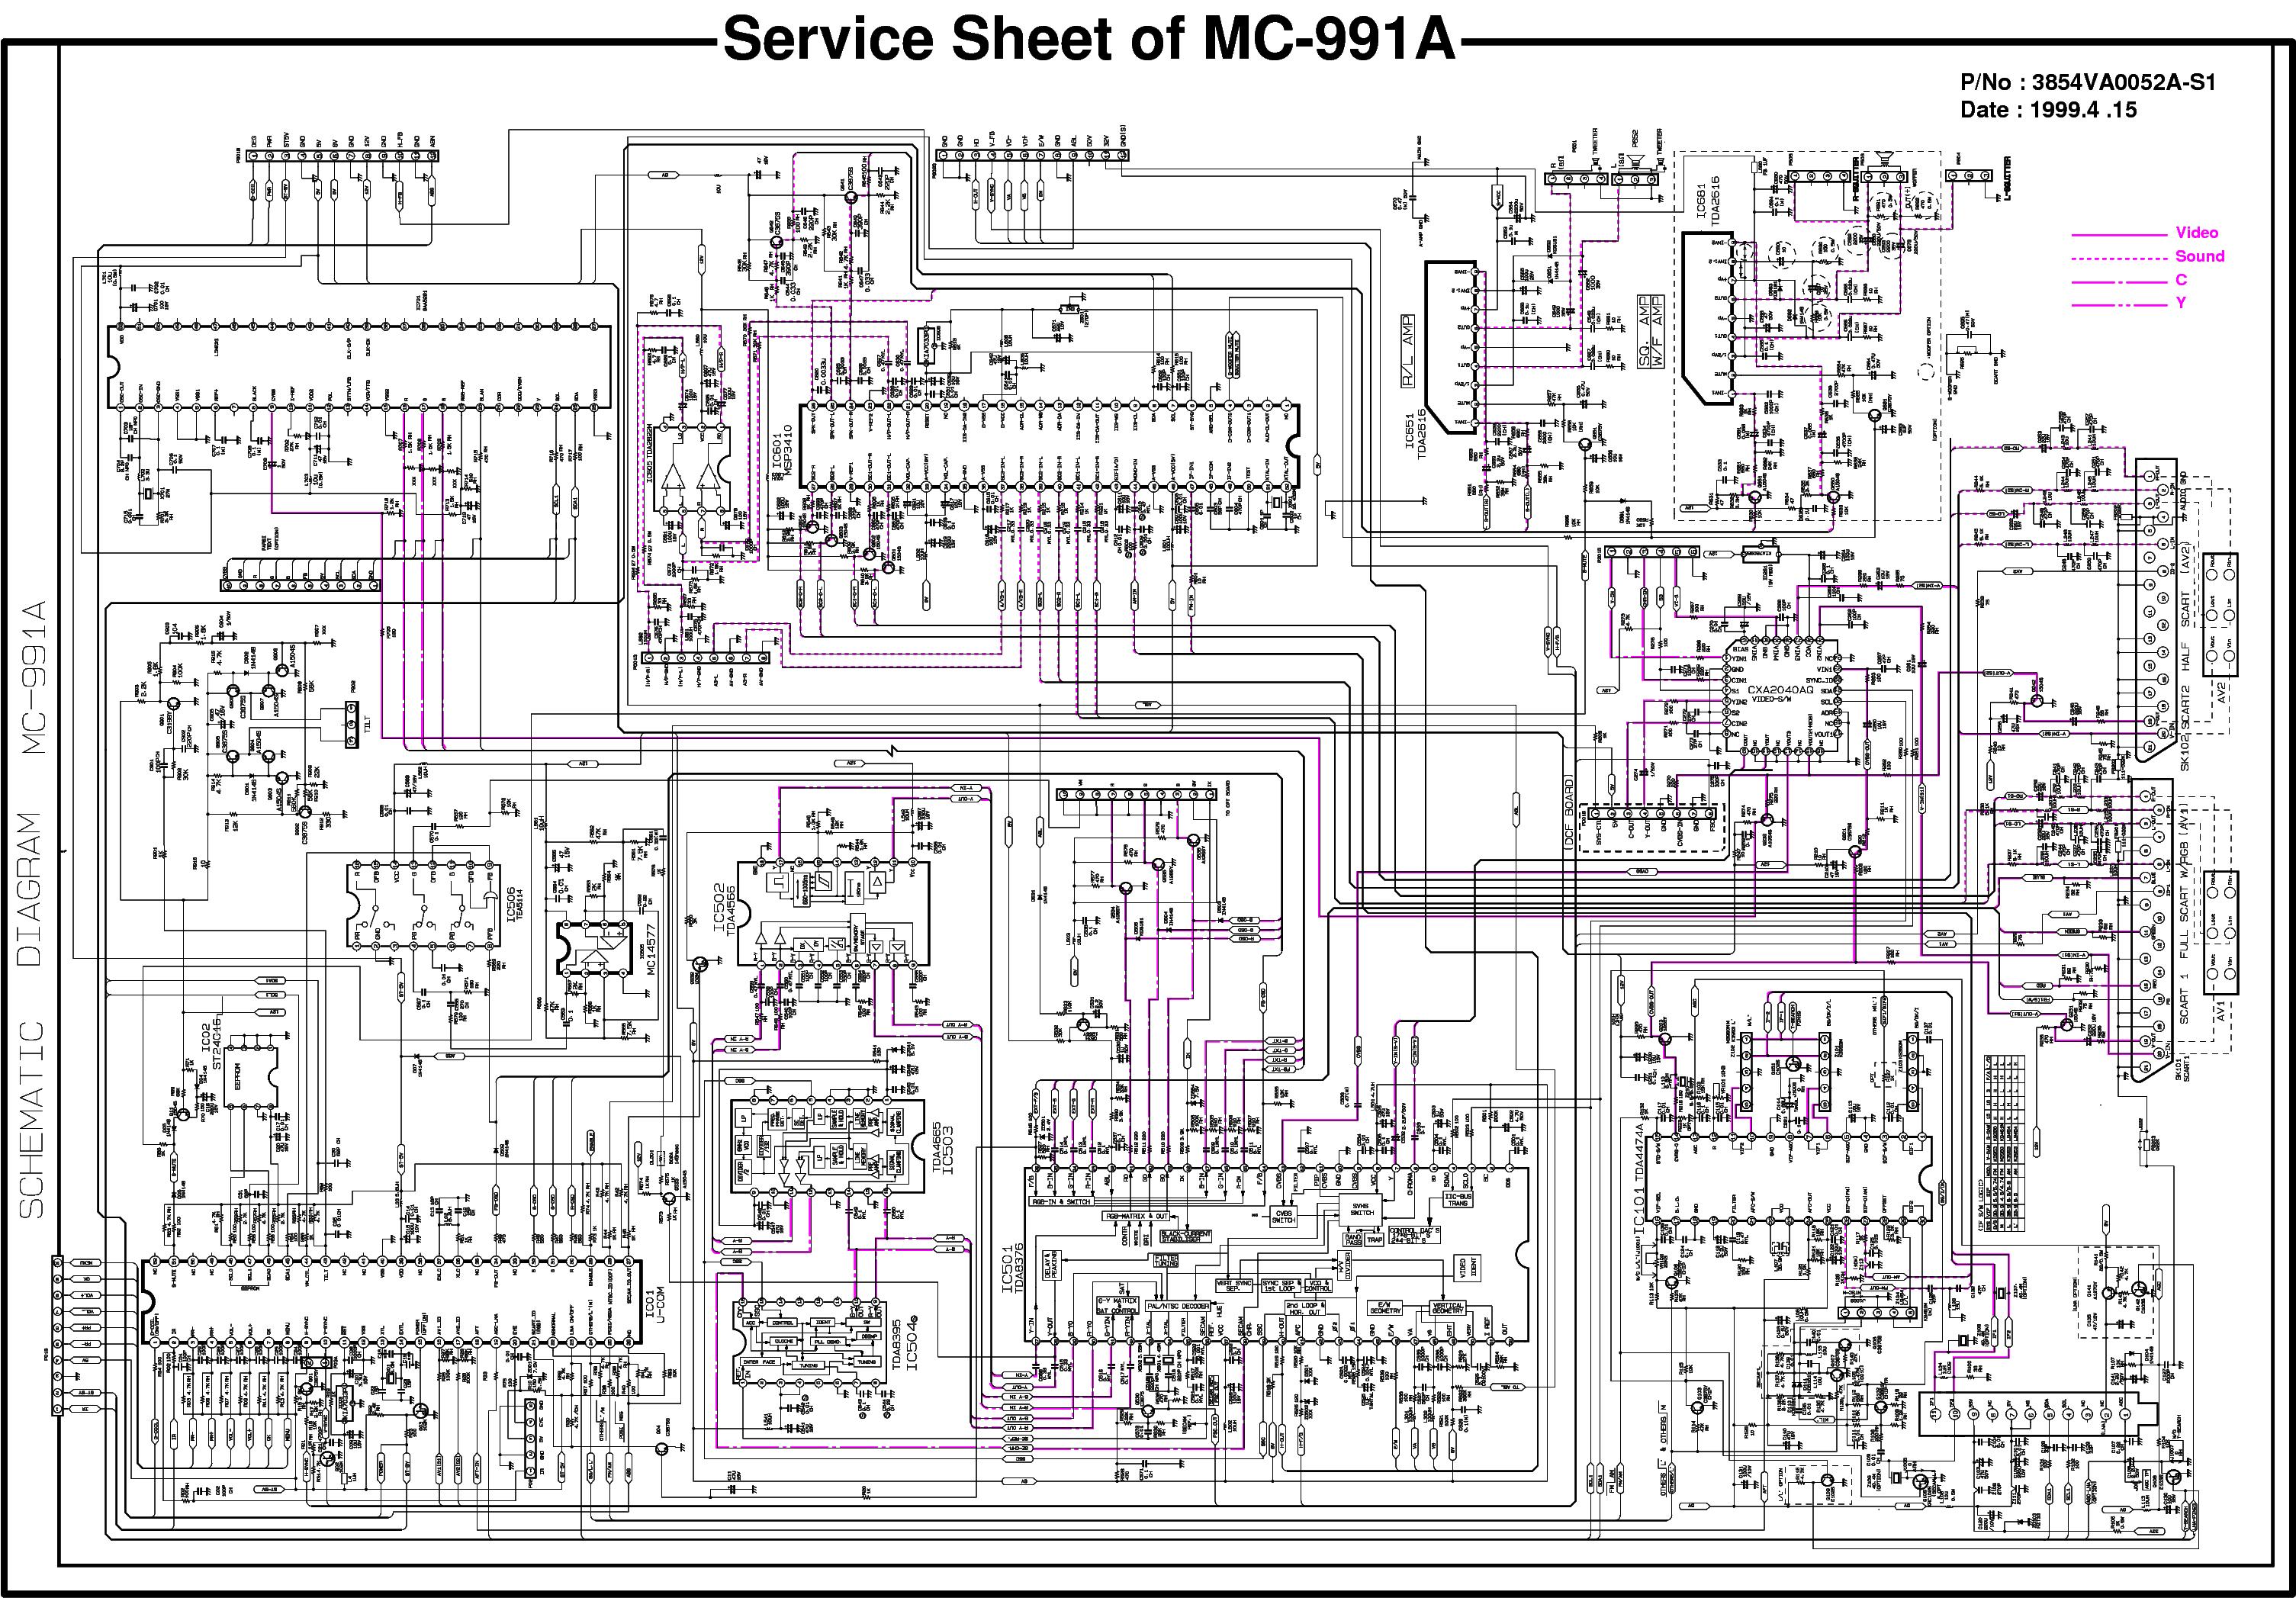 Lg rt 20ca50m схема шасси мс-019а схема